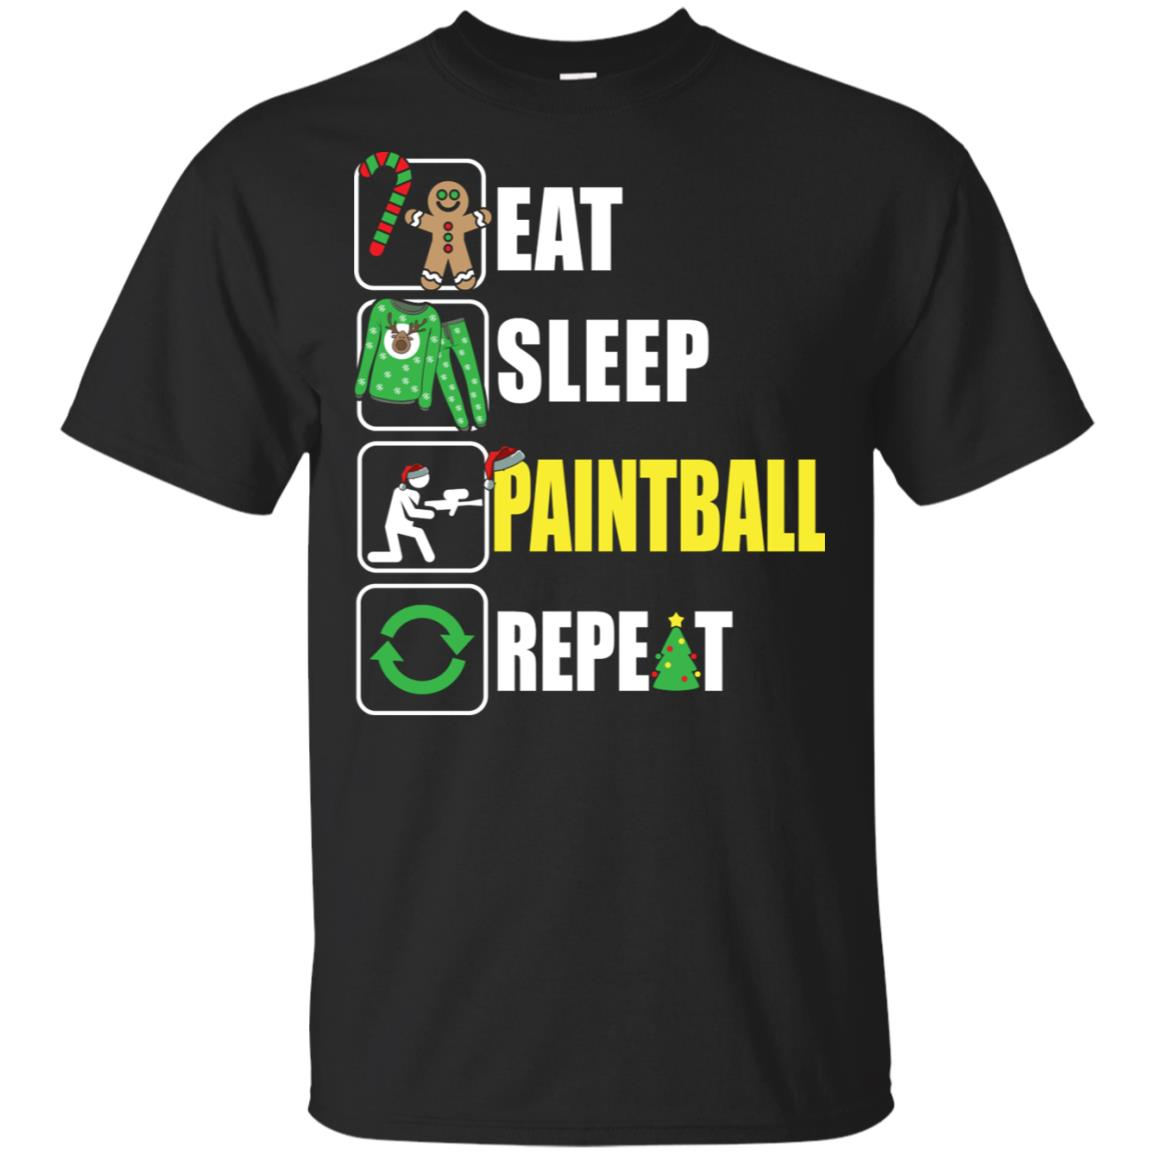 Eat Sleep Paintball Repeat Paintball Lover Unisex Short Sleeve